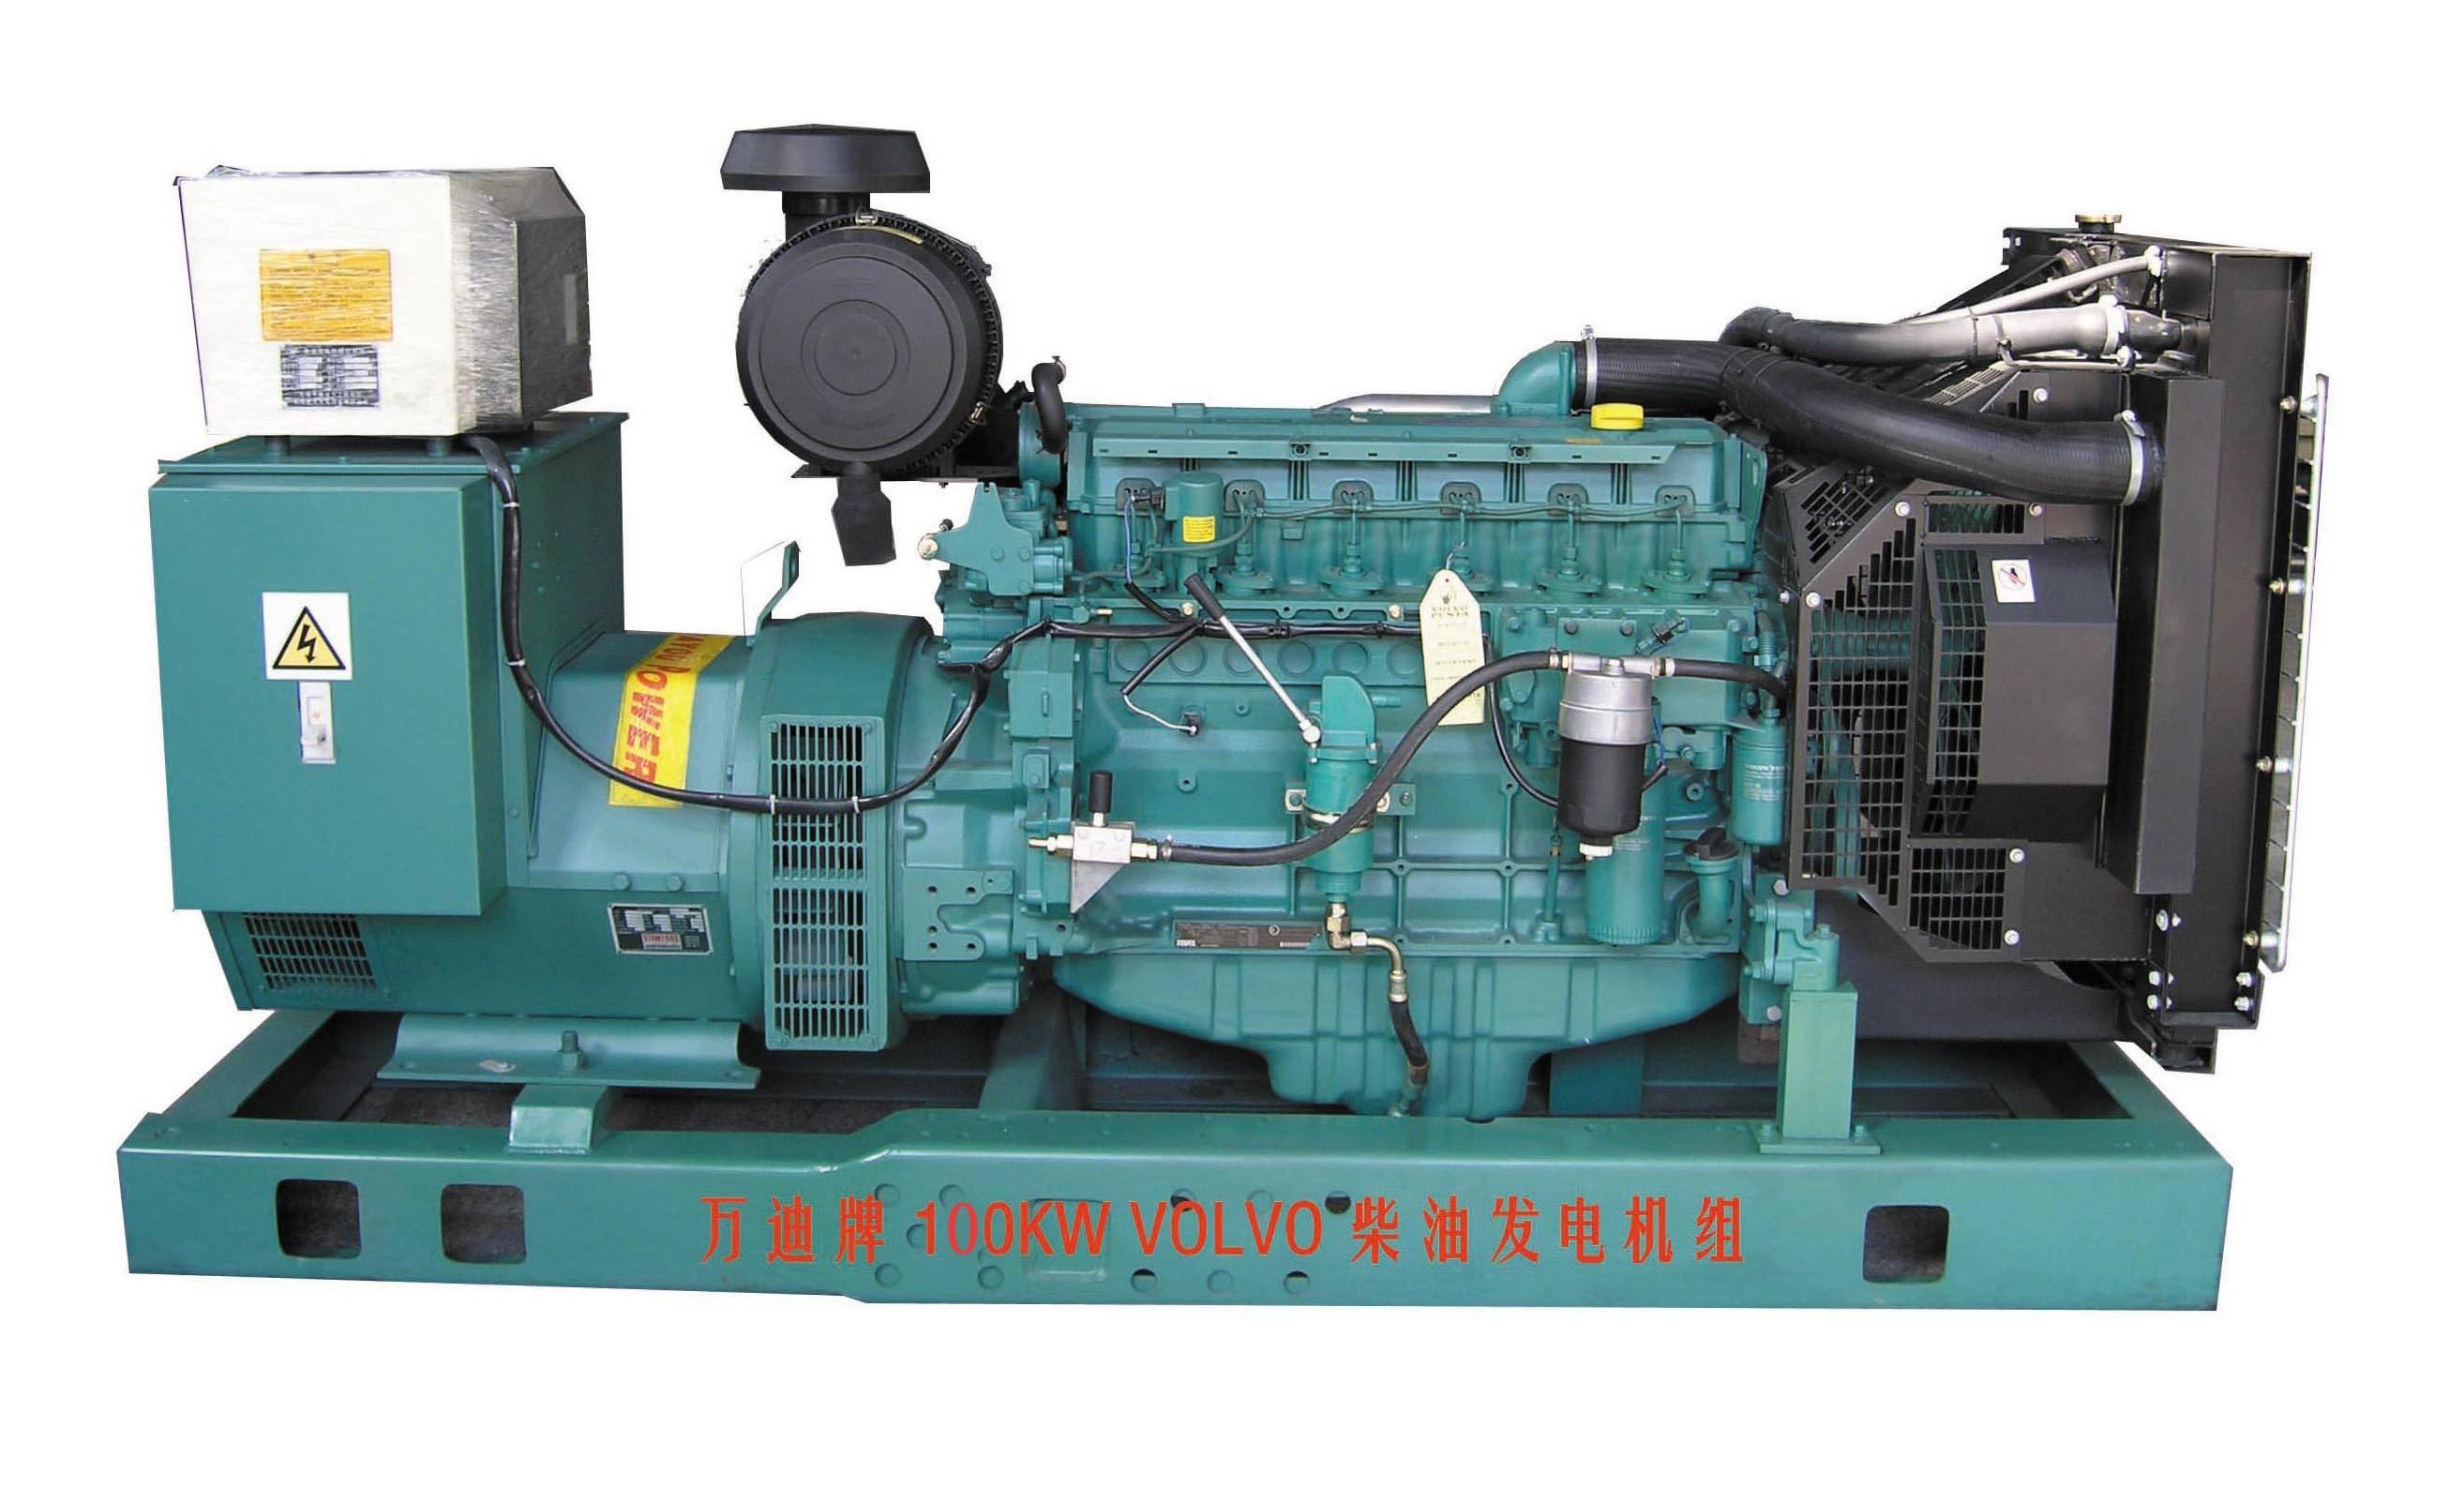 VOLVO 50HZ 400V 100kw diesel generator